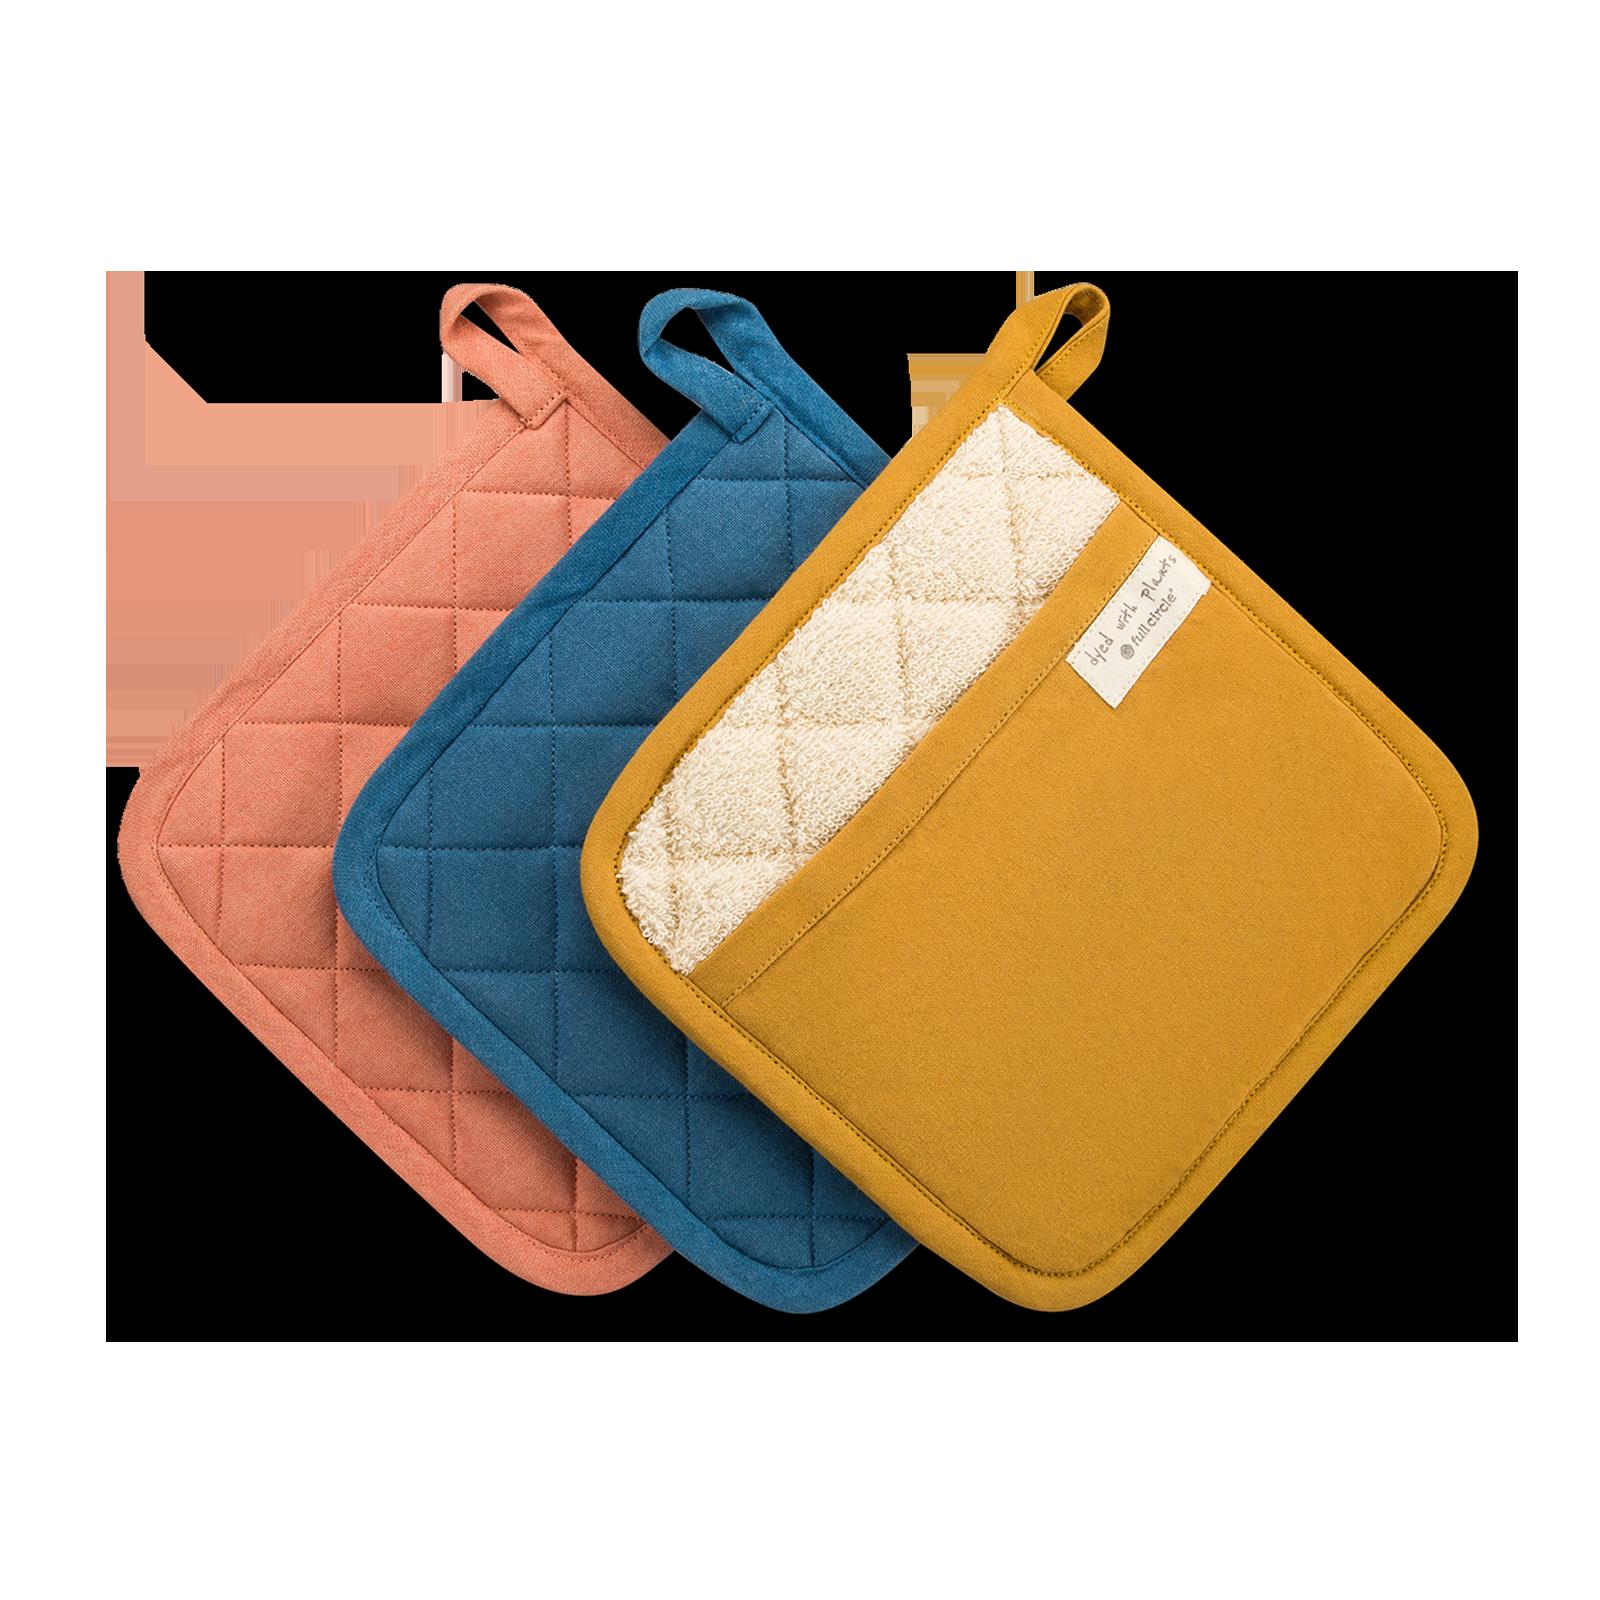 Pot holder product image